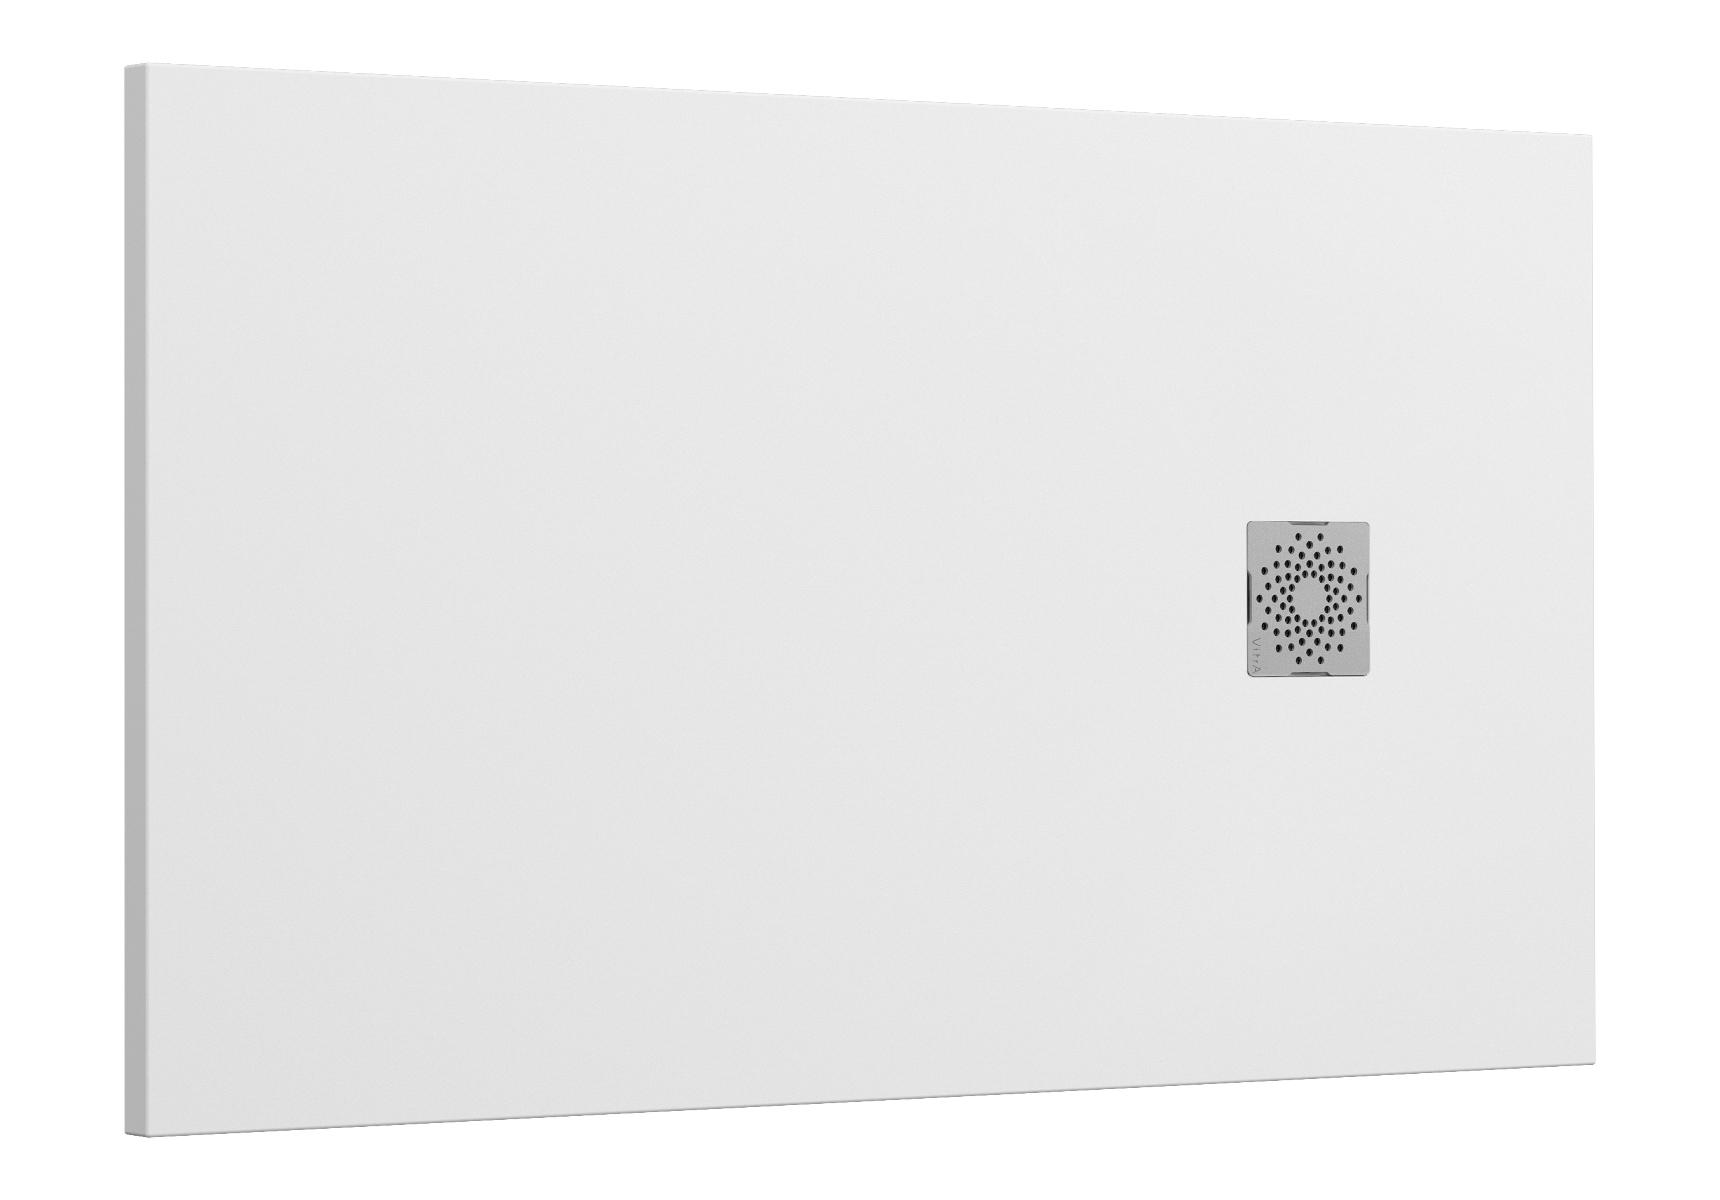 V-Stone Duschwanne, 140 x 80 cm, Weiß